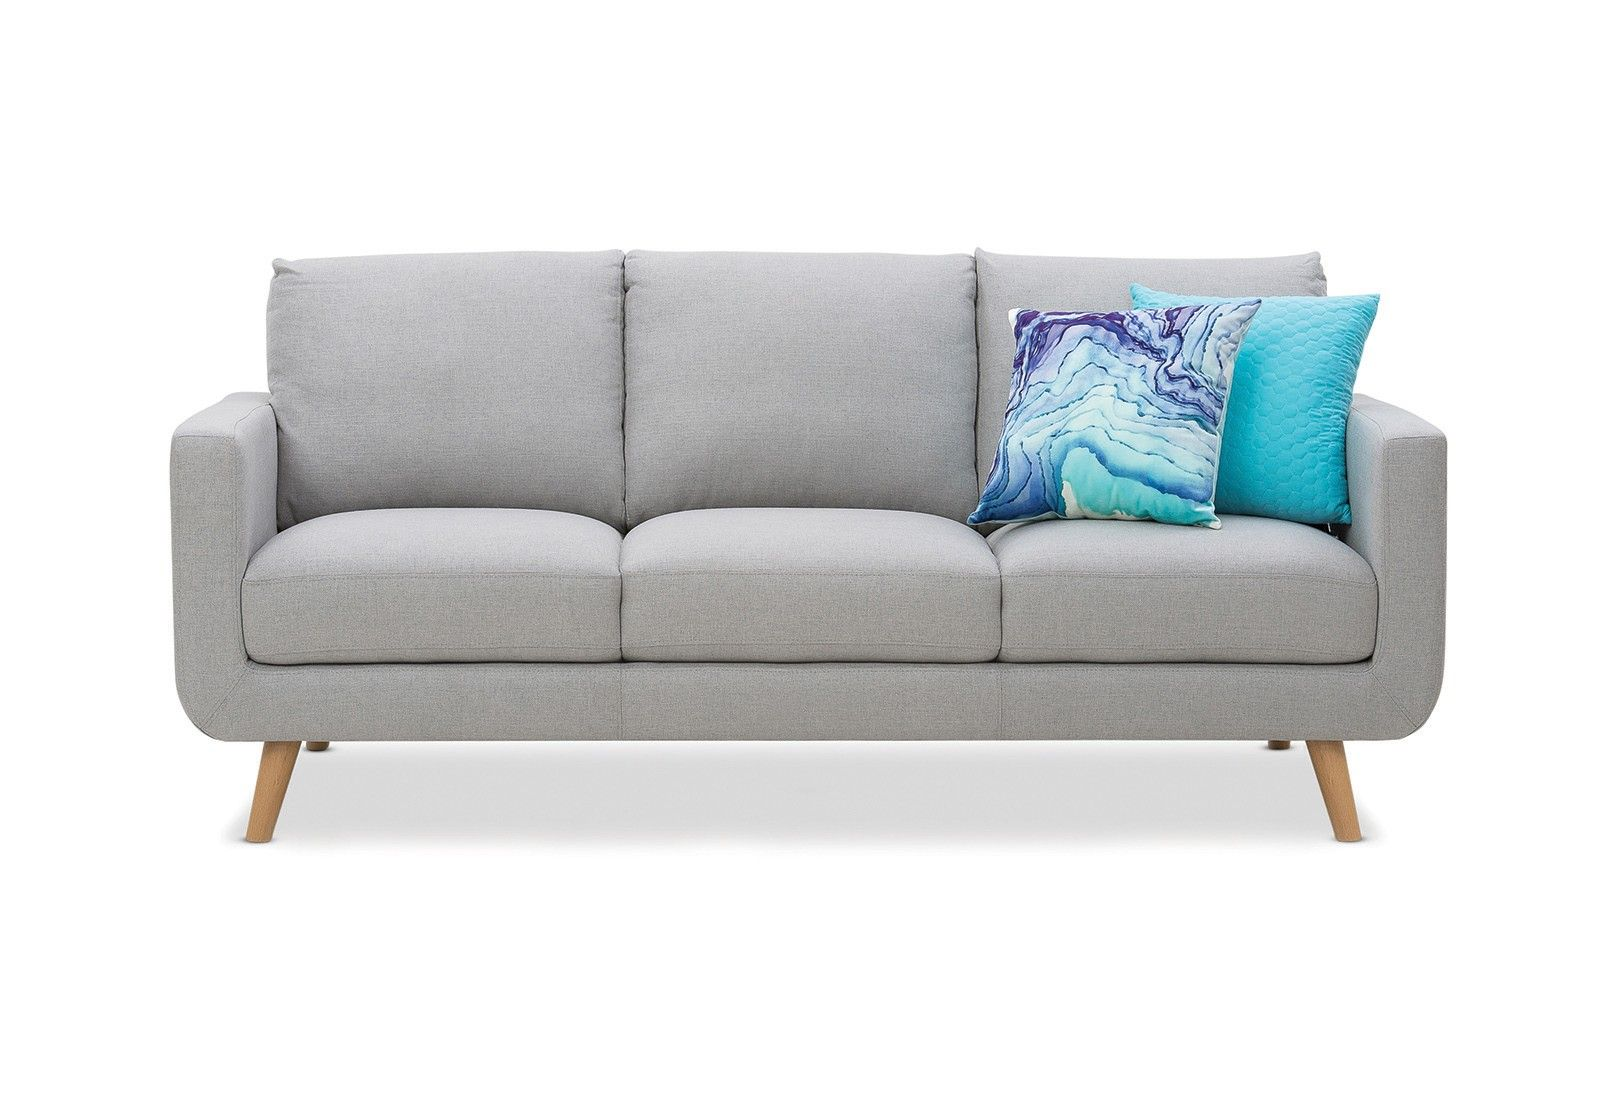 sofa beds on gumtree adelaide erfaringer med bolia sofaer amart couch creativeadvertisingblog